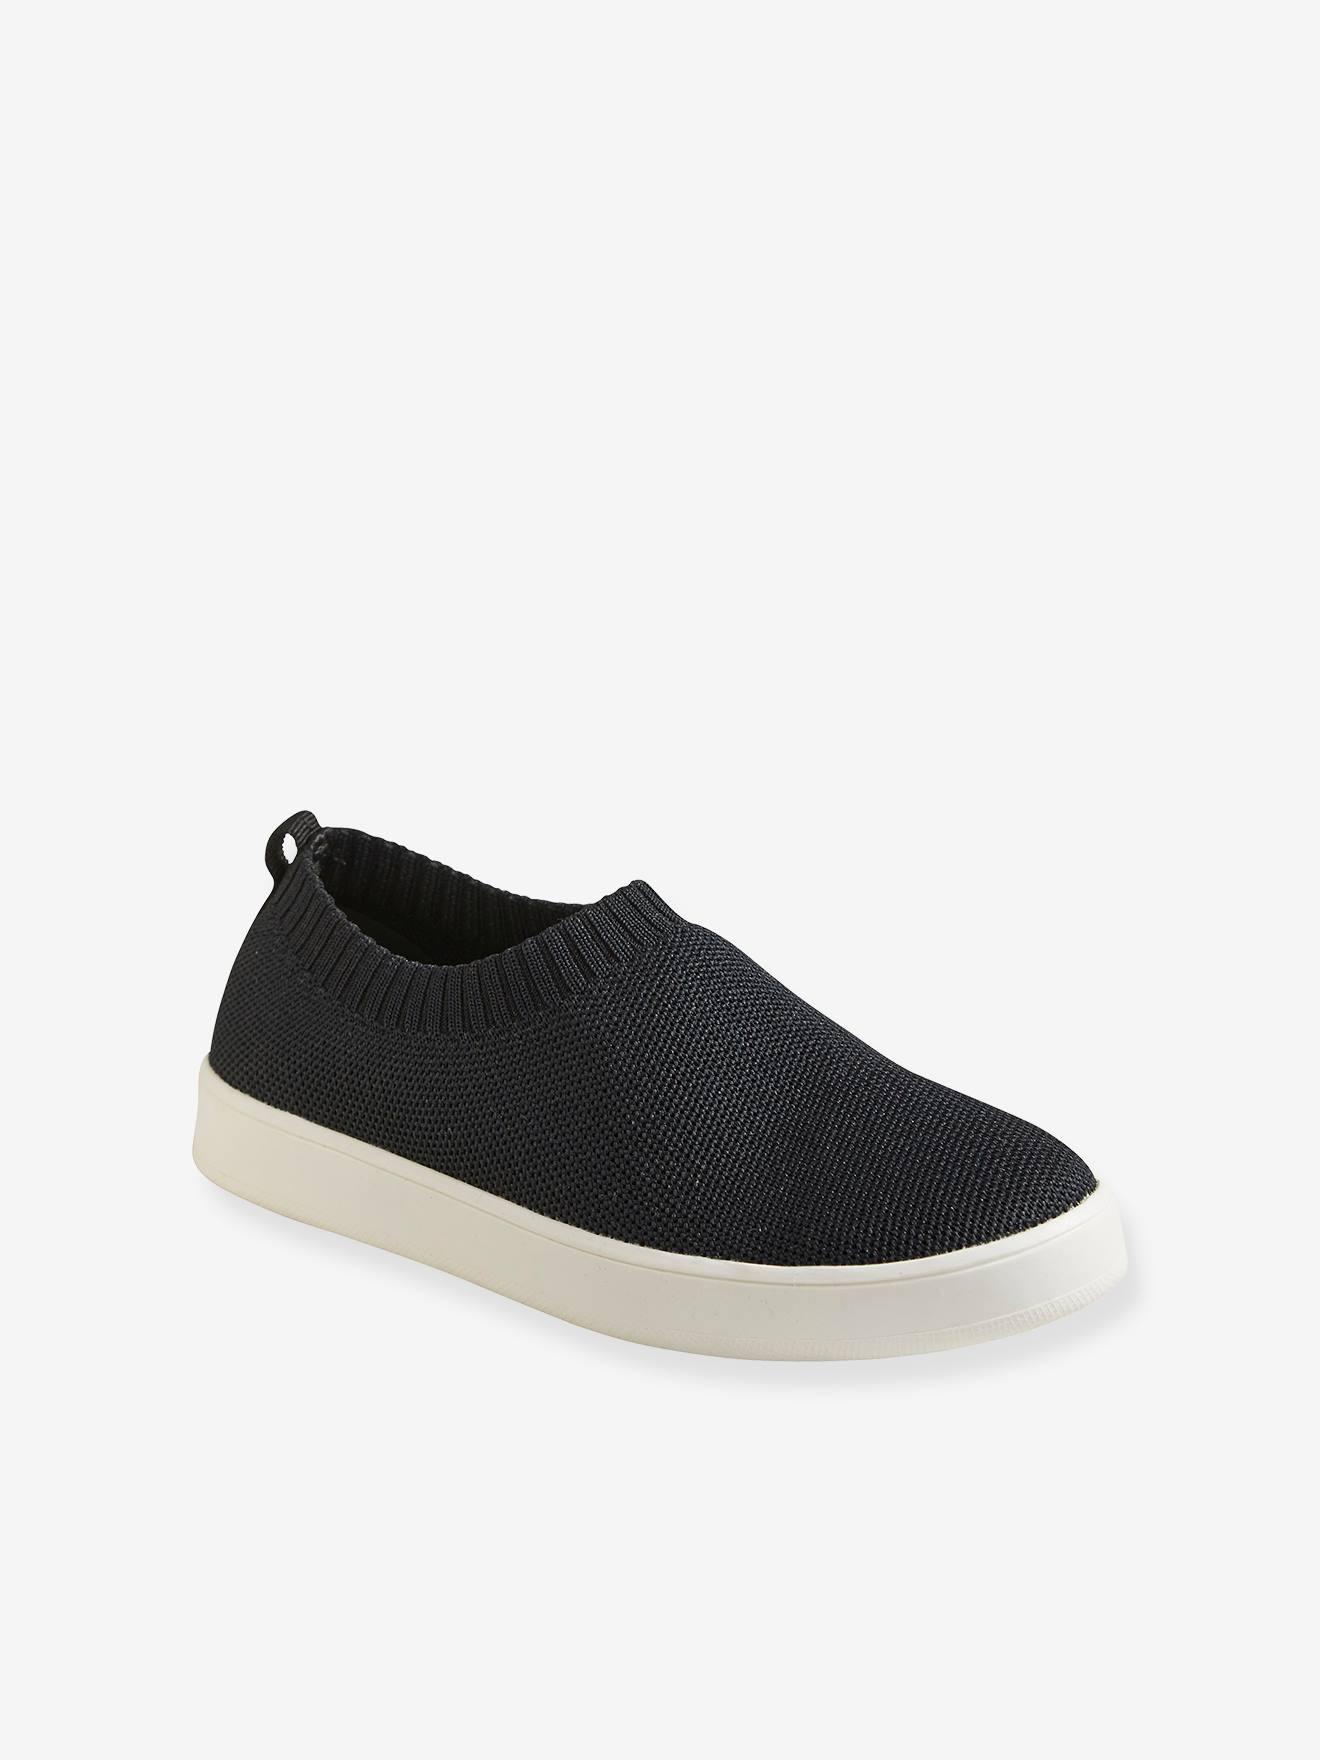 shoe for girls